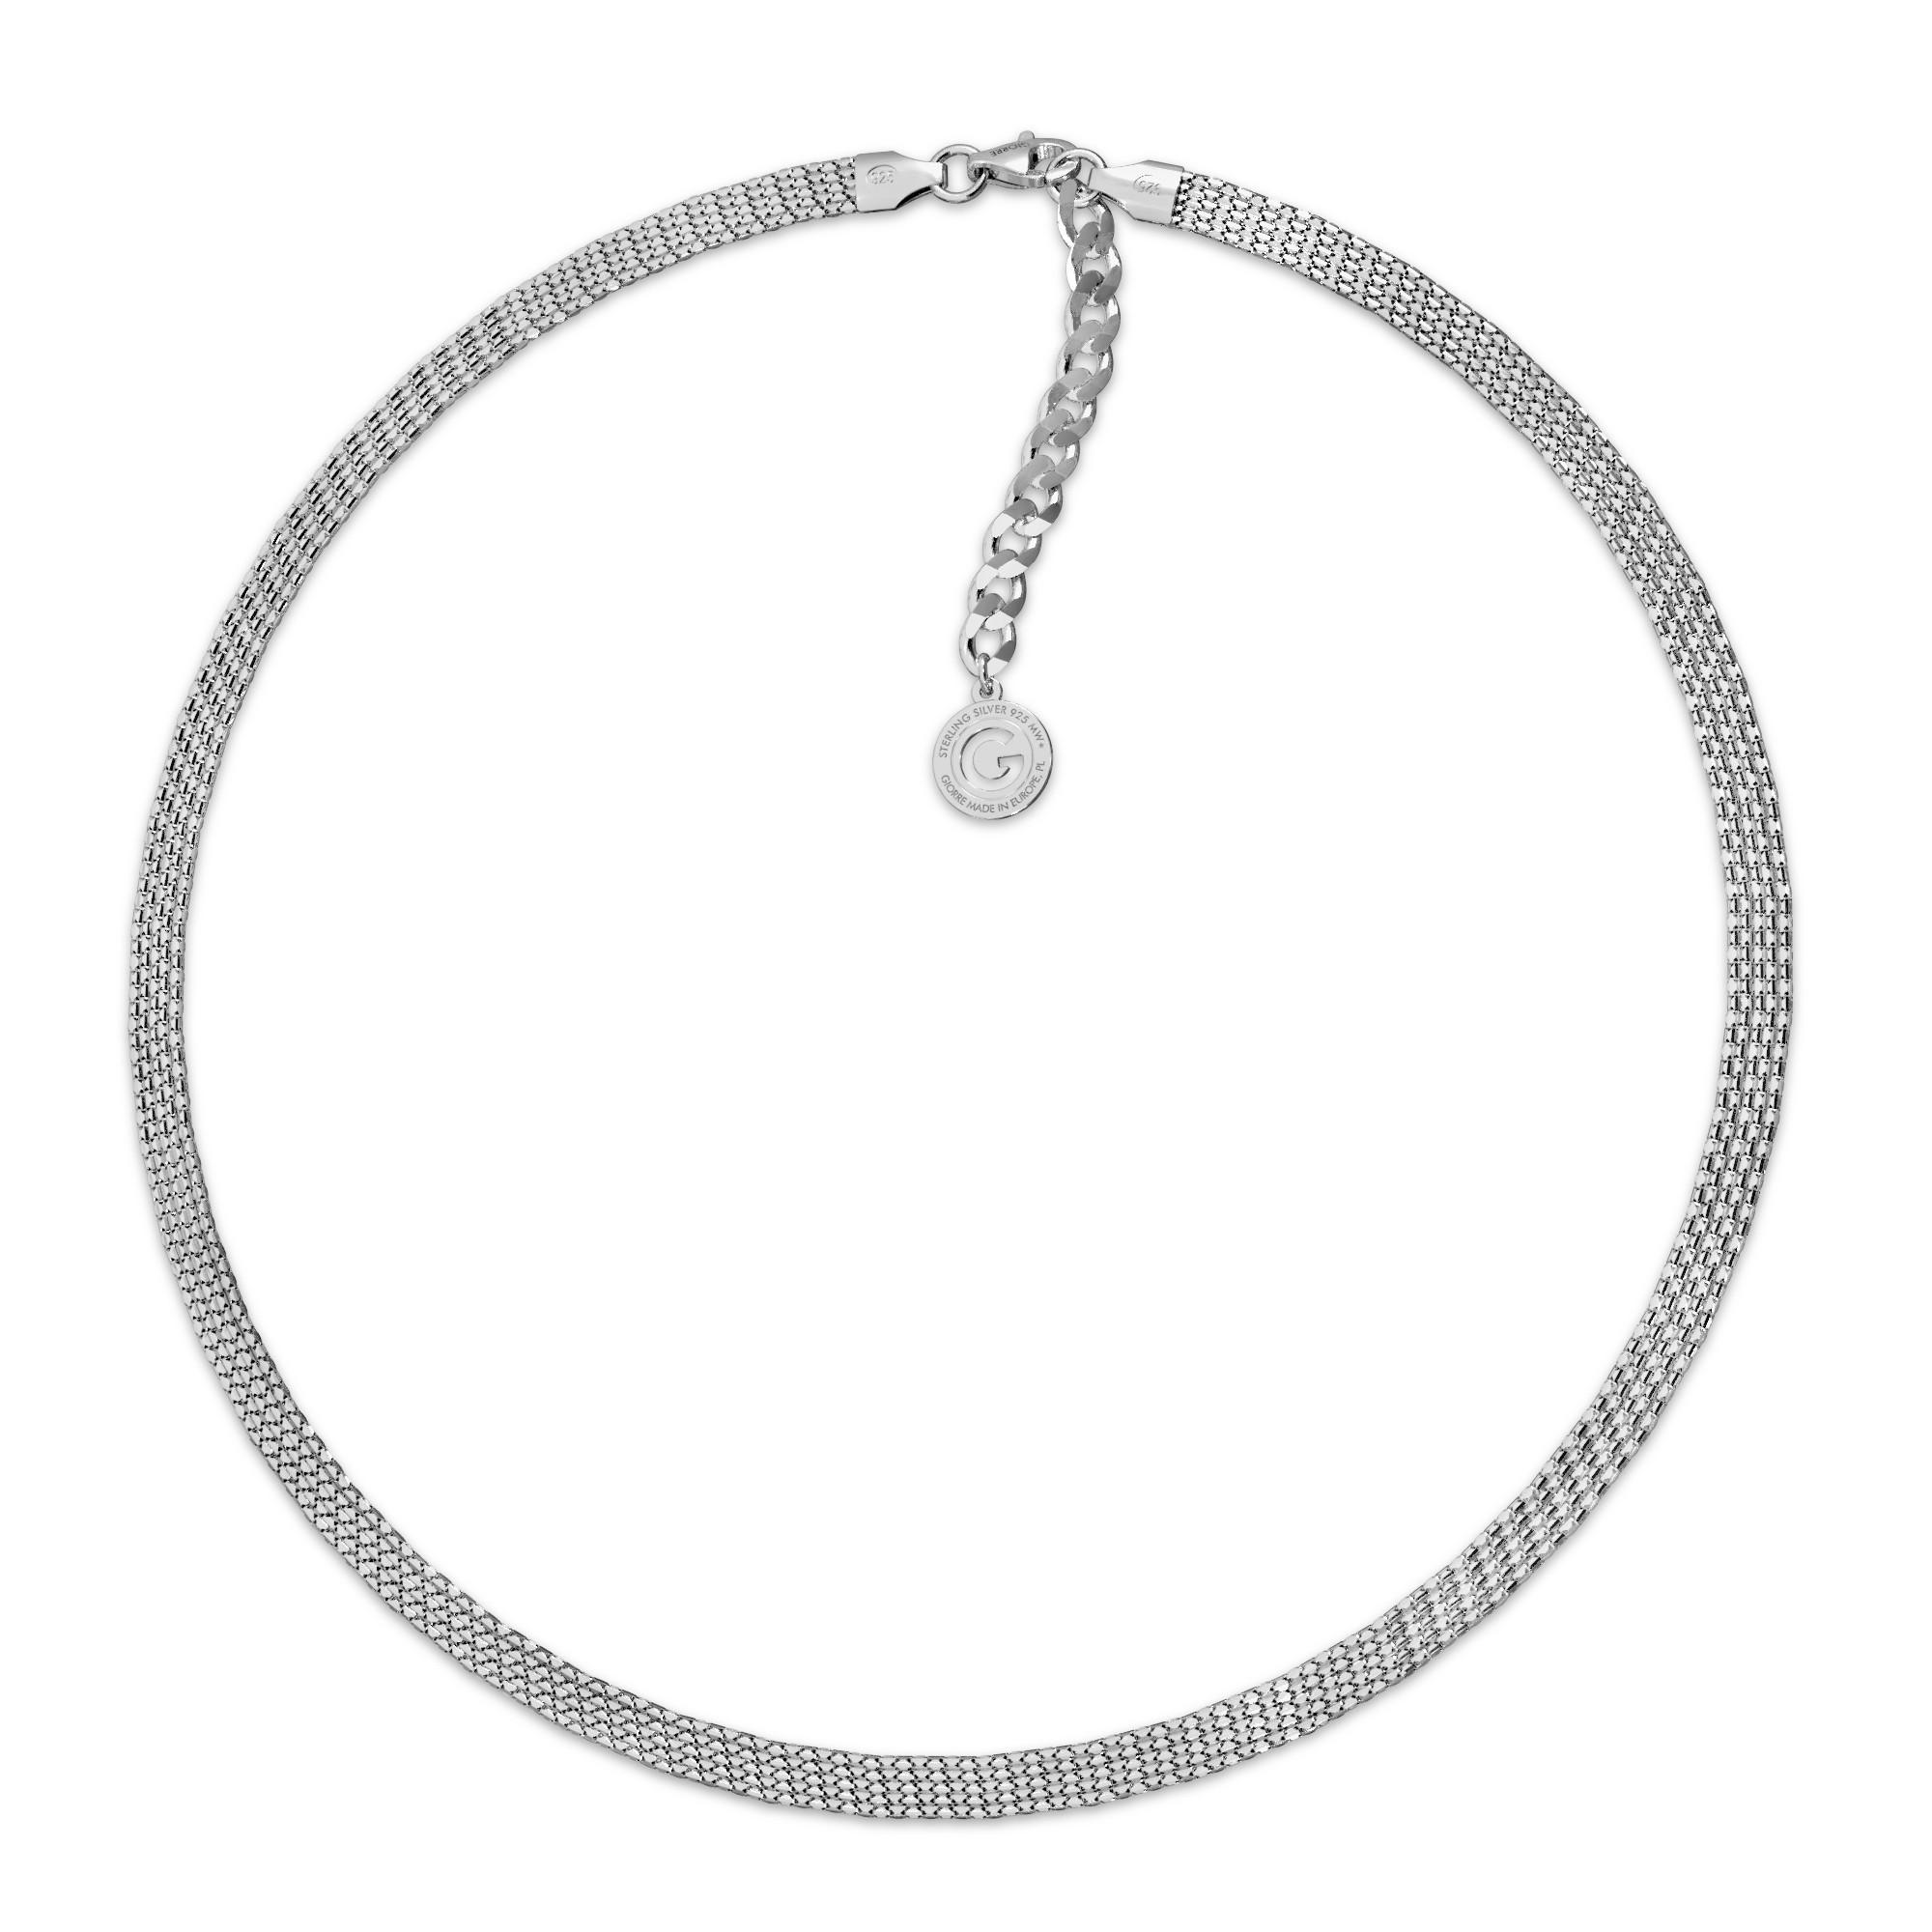 Srebrny choker z 5 łańcuszków 925